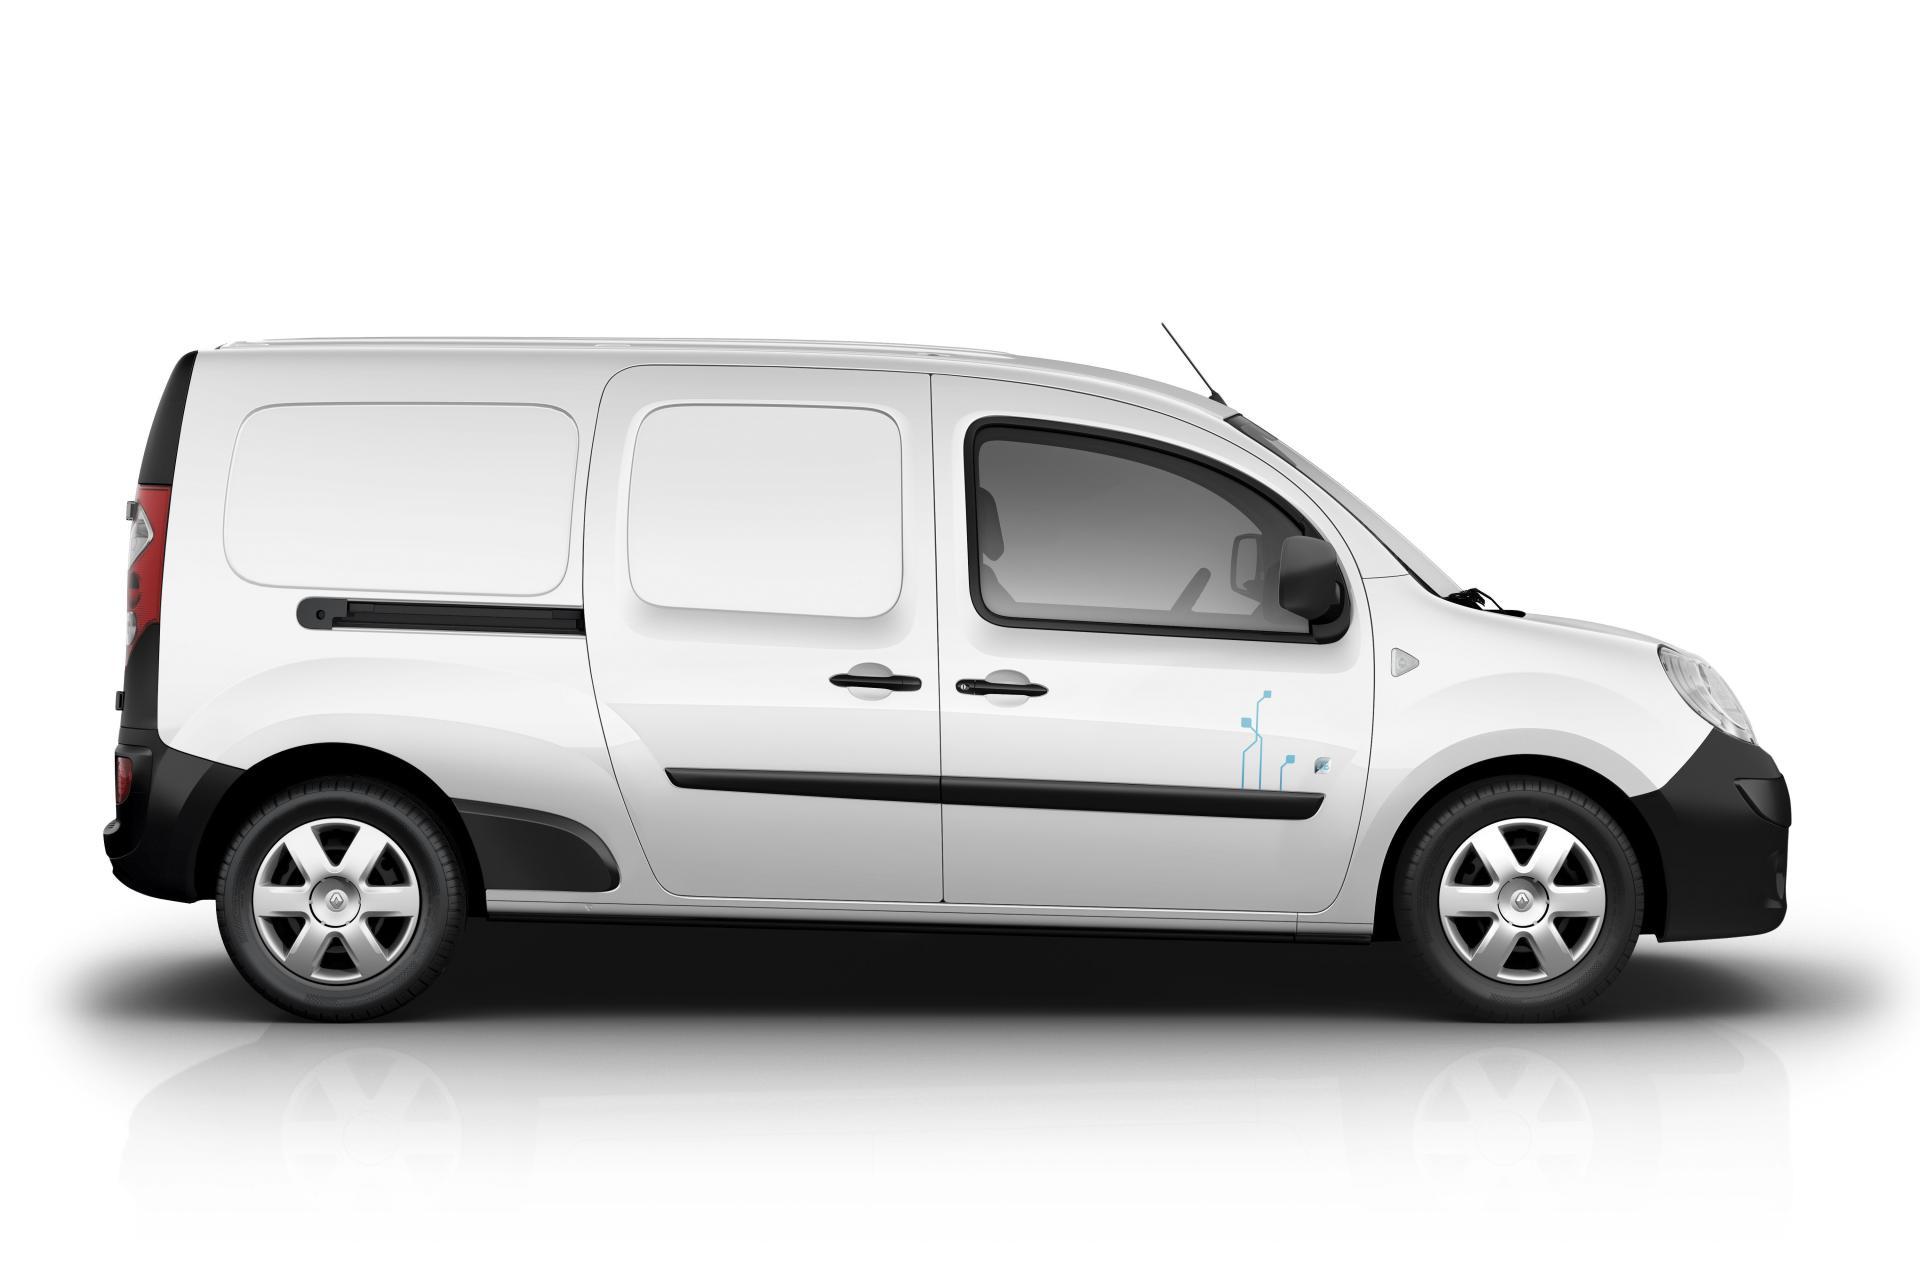 Vans Auto Sales >> 2012 Renault Kangoo Z.E. - conceptcarz.com